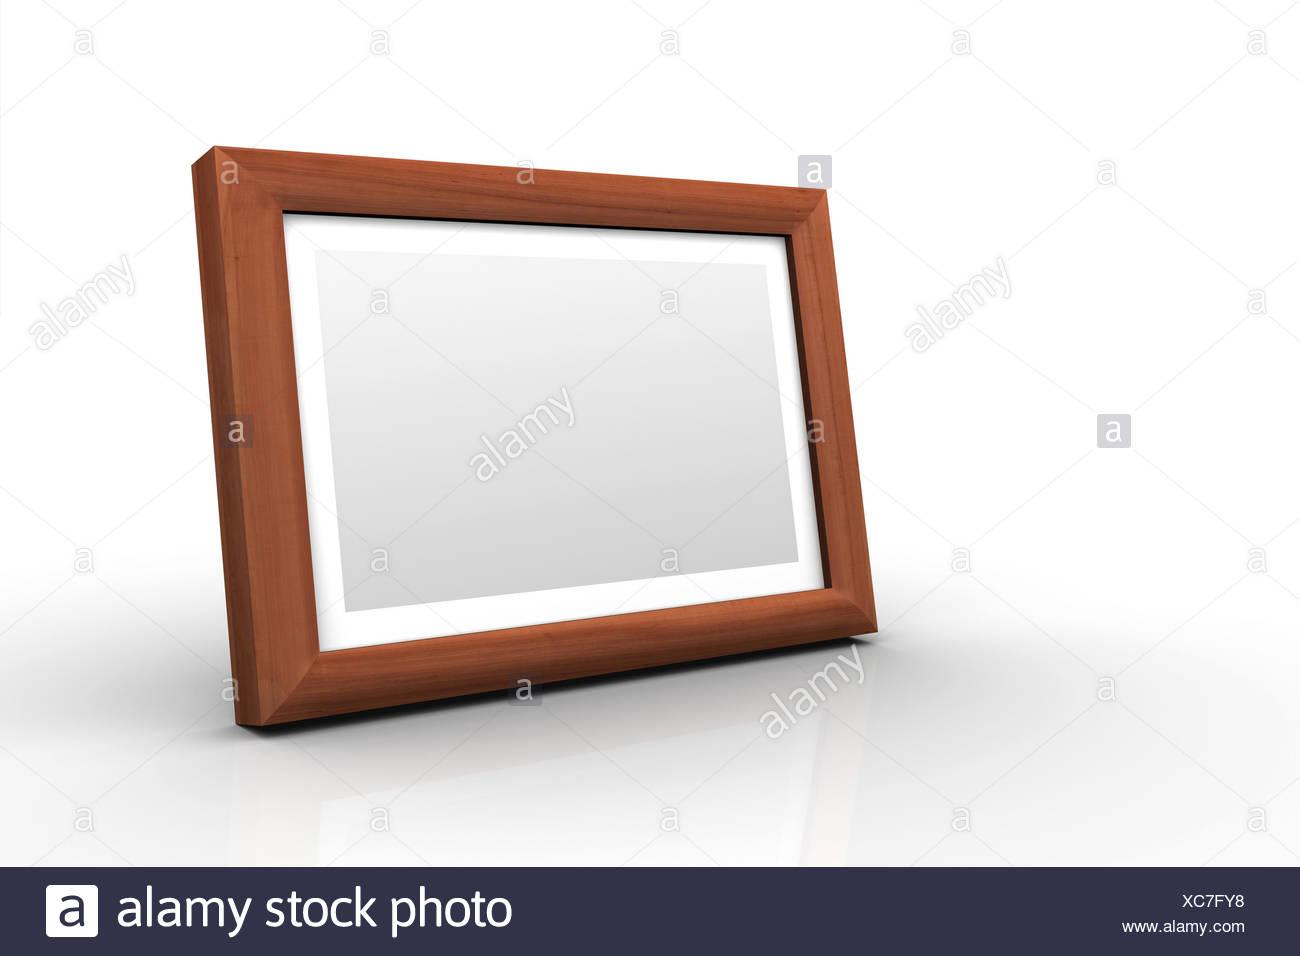 Beste Holzplattform Bettge Fotos - Benutzerdefinierte Bilderrahmen ...